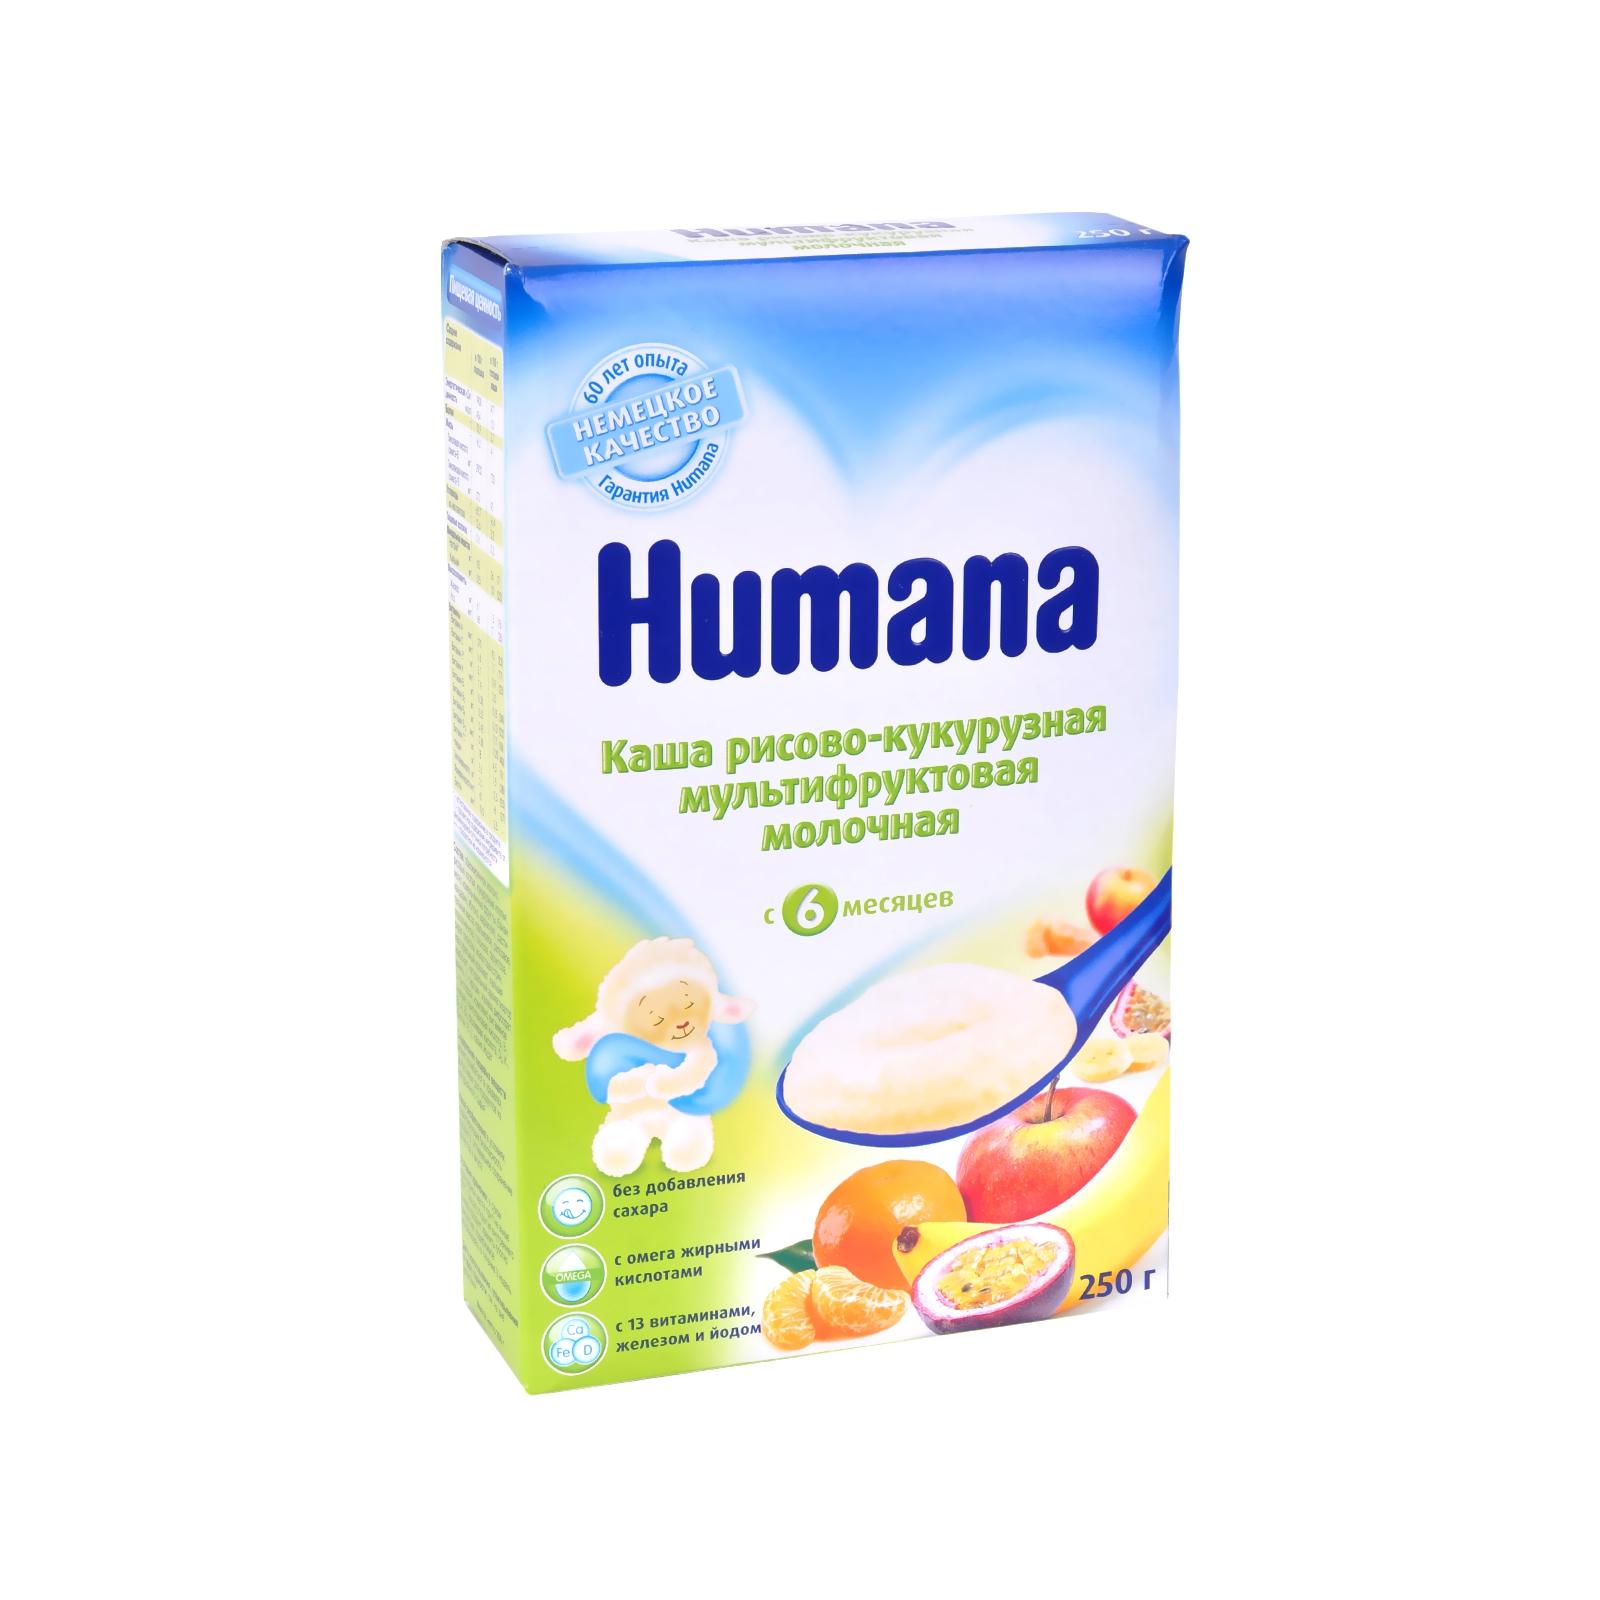 ���� Humana �������� 250 �� ������ ���������� � �������� (� 6 ���)